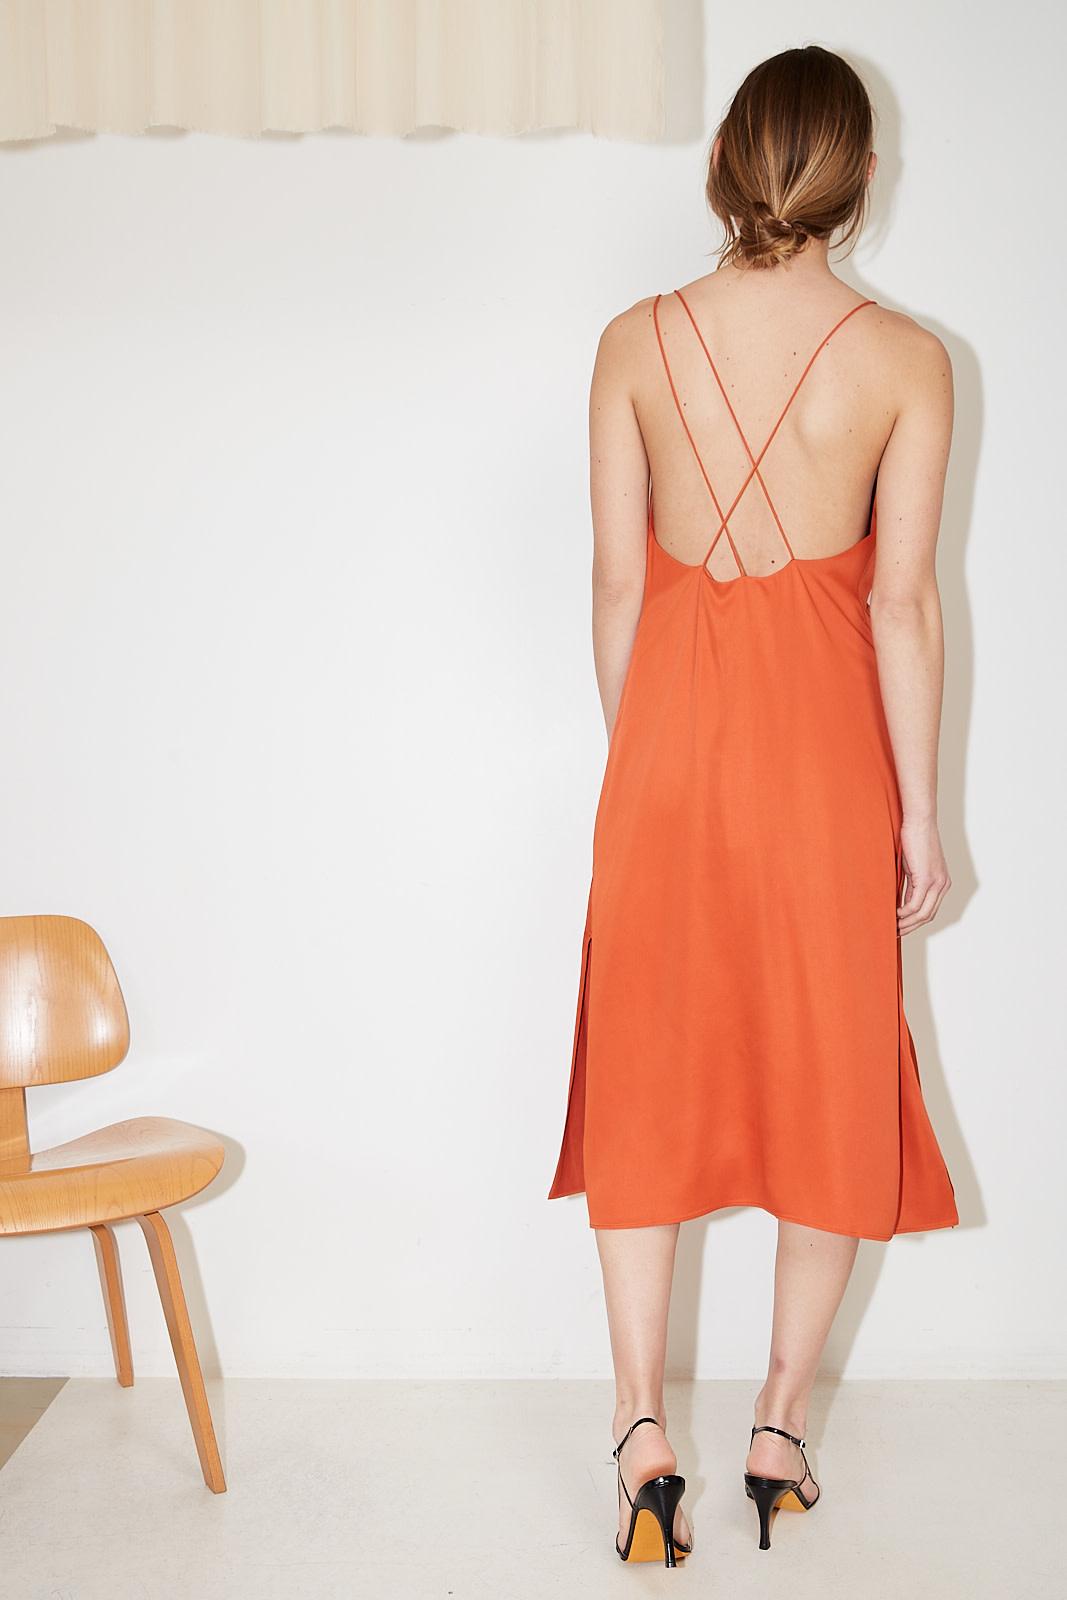 Aeron - Giselle recycled satin dress